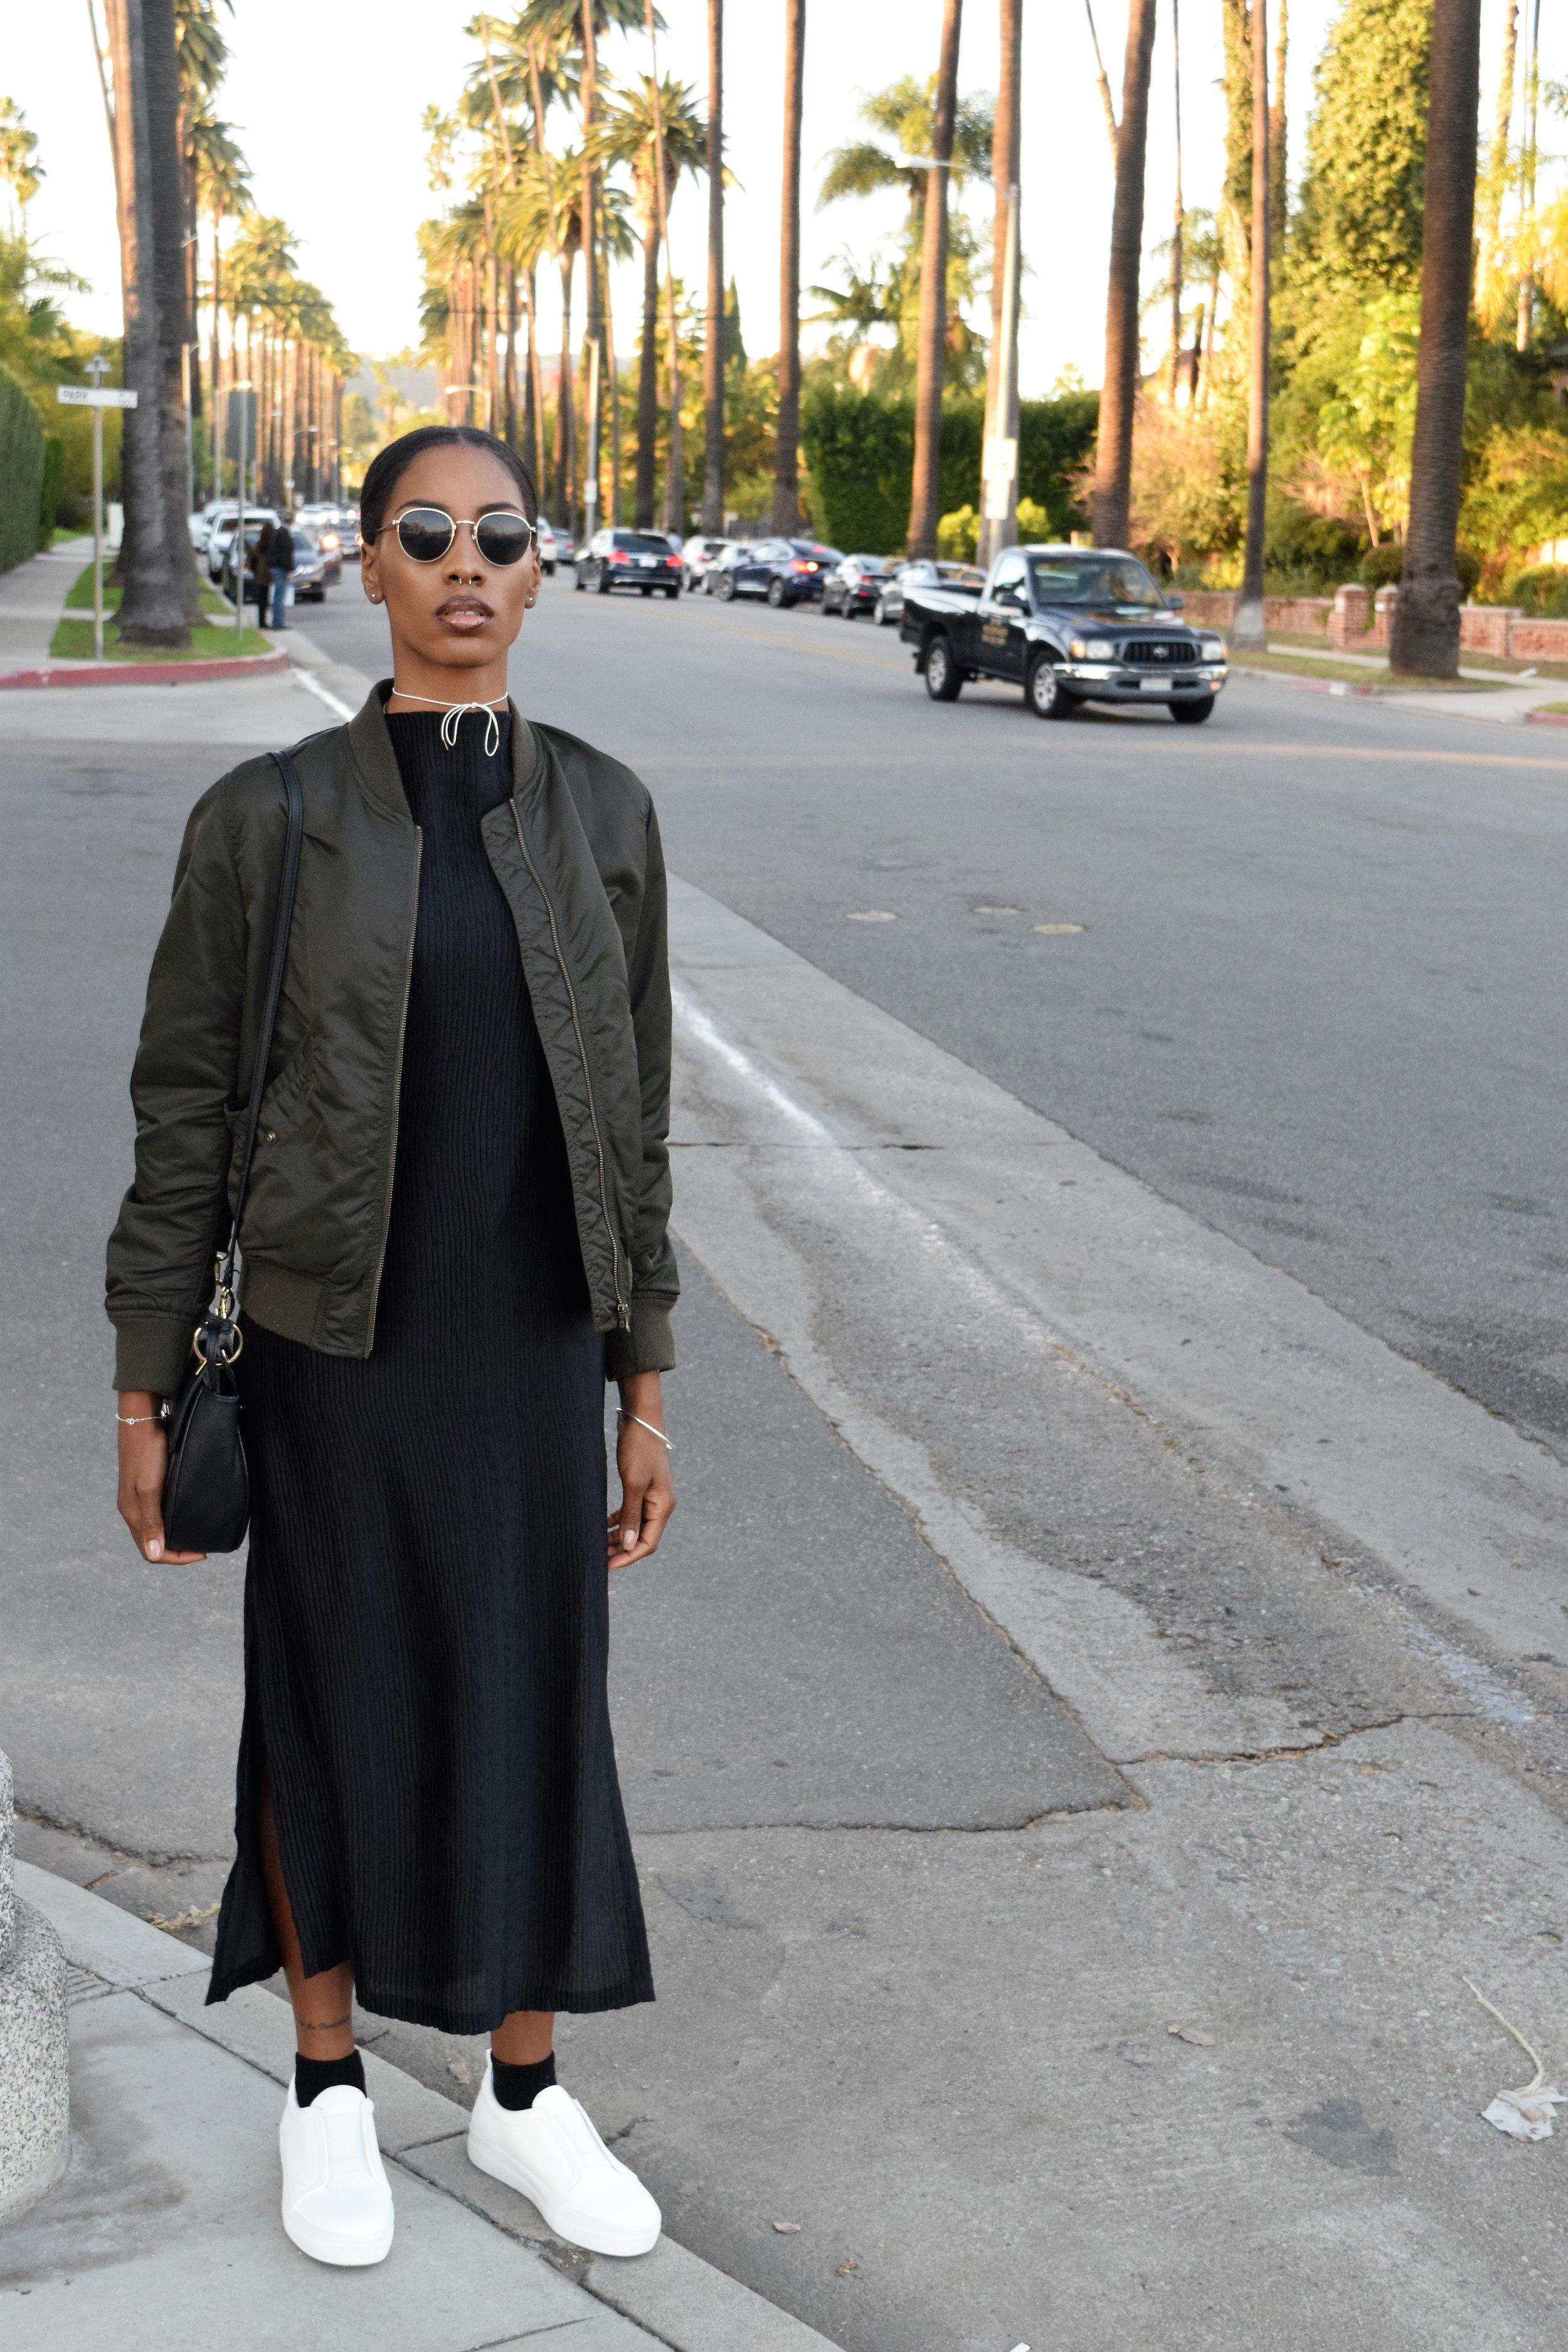 Third Form Zara Poppy Chain Minimal Style Daily